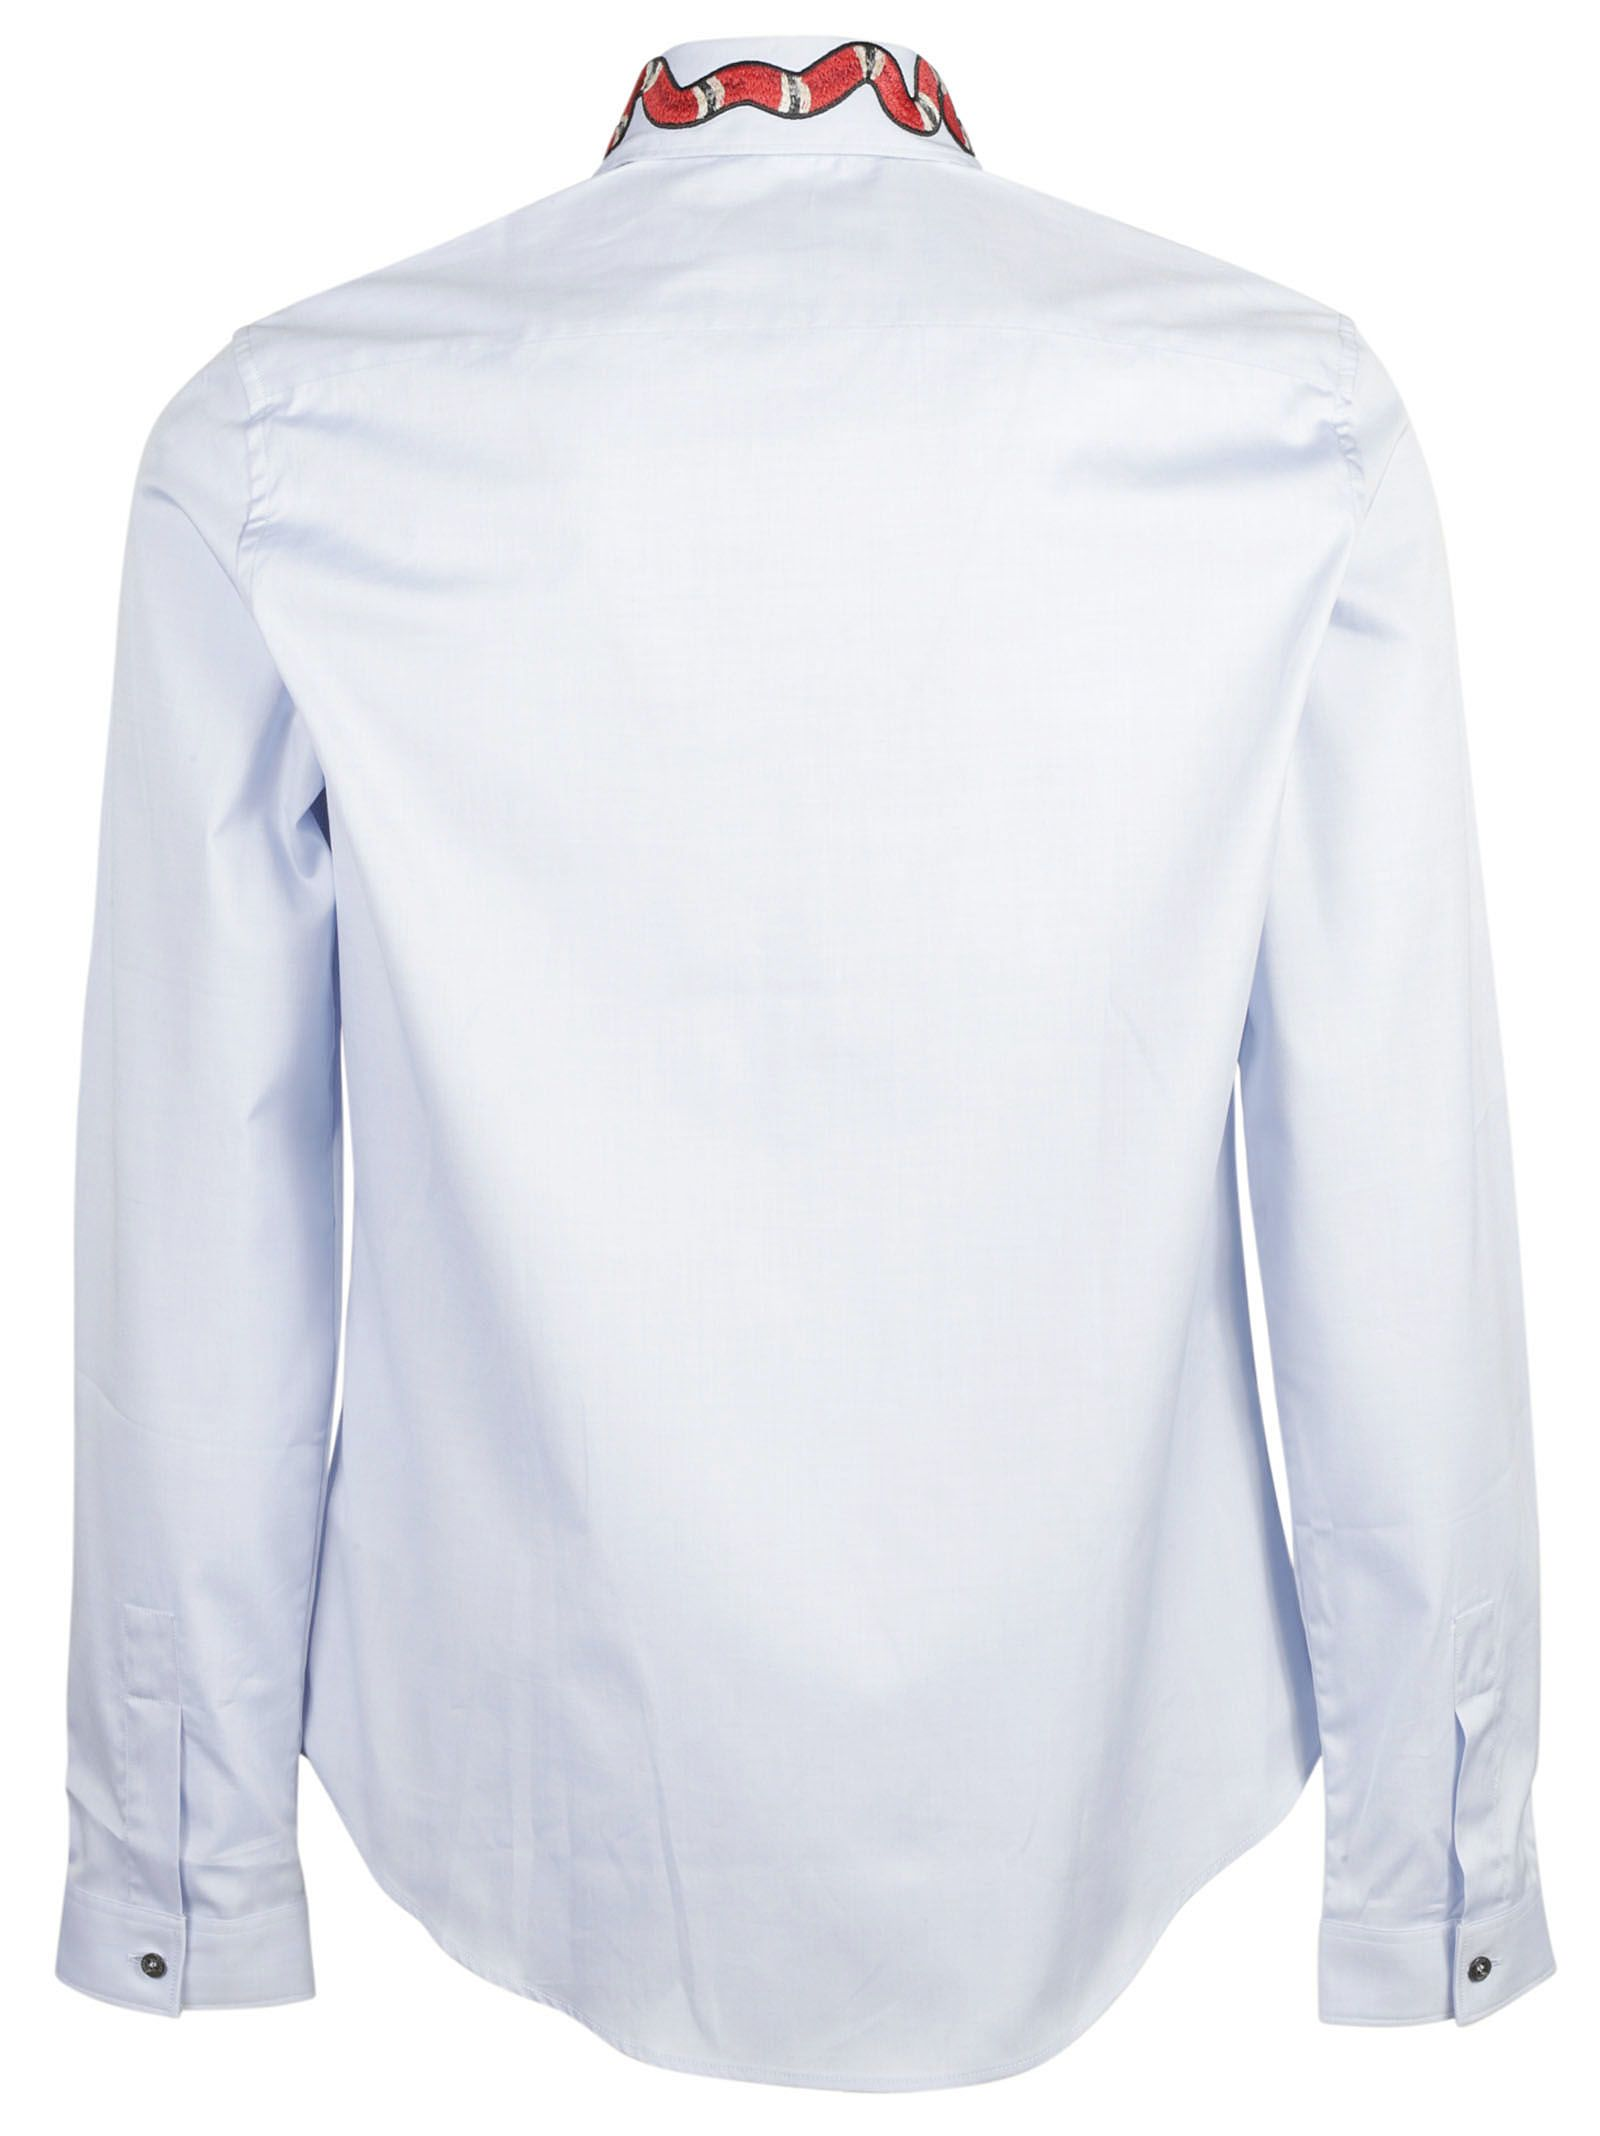 Gucci Gucci Snake Patch Shirt Baby Blue Men s Shirts